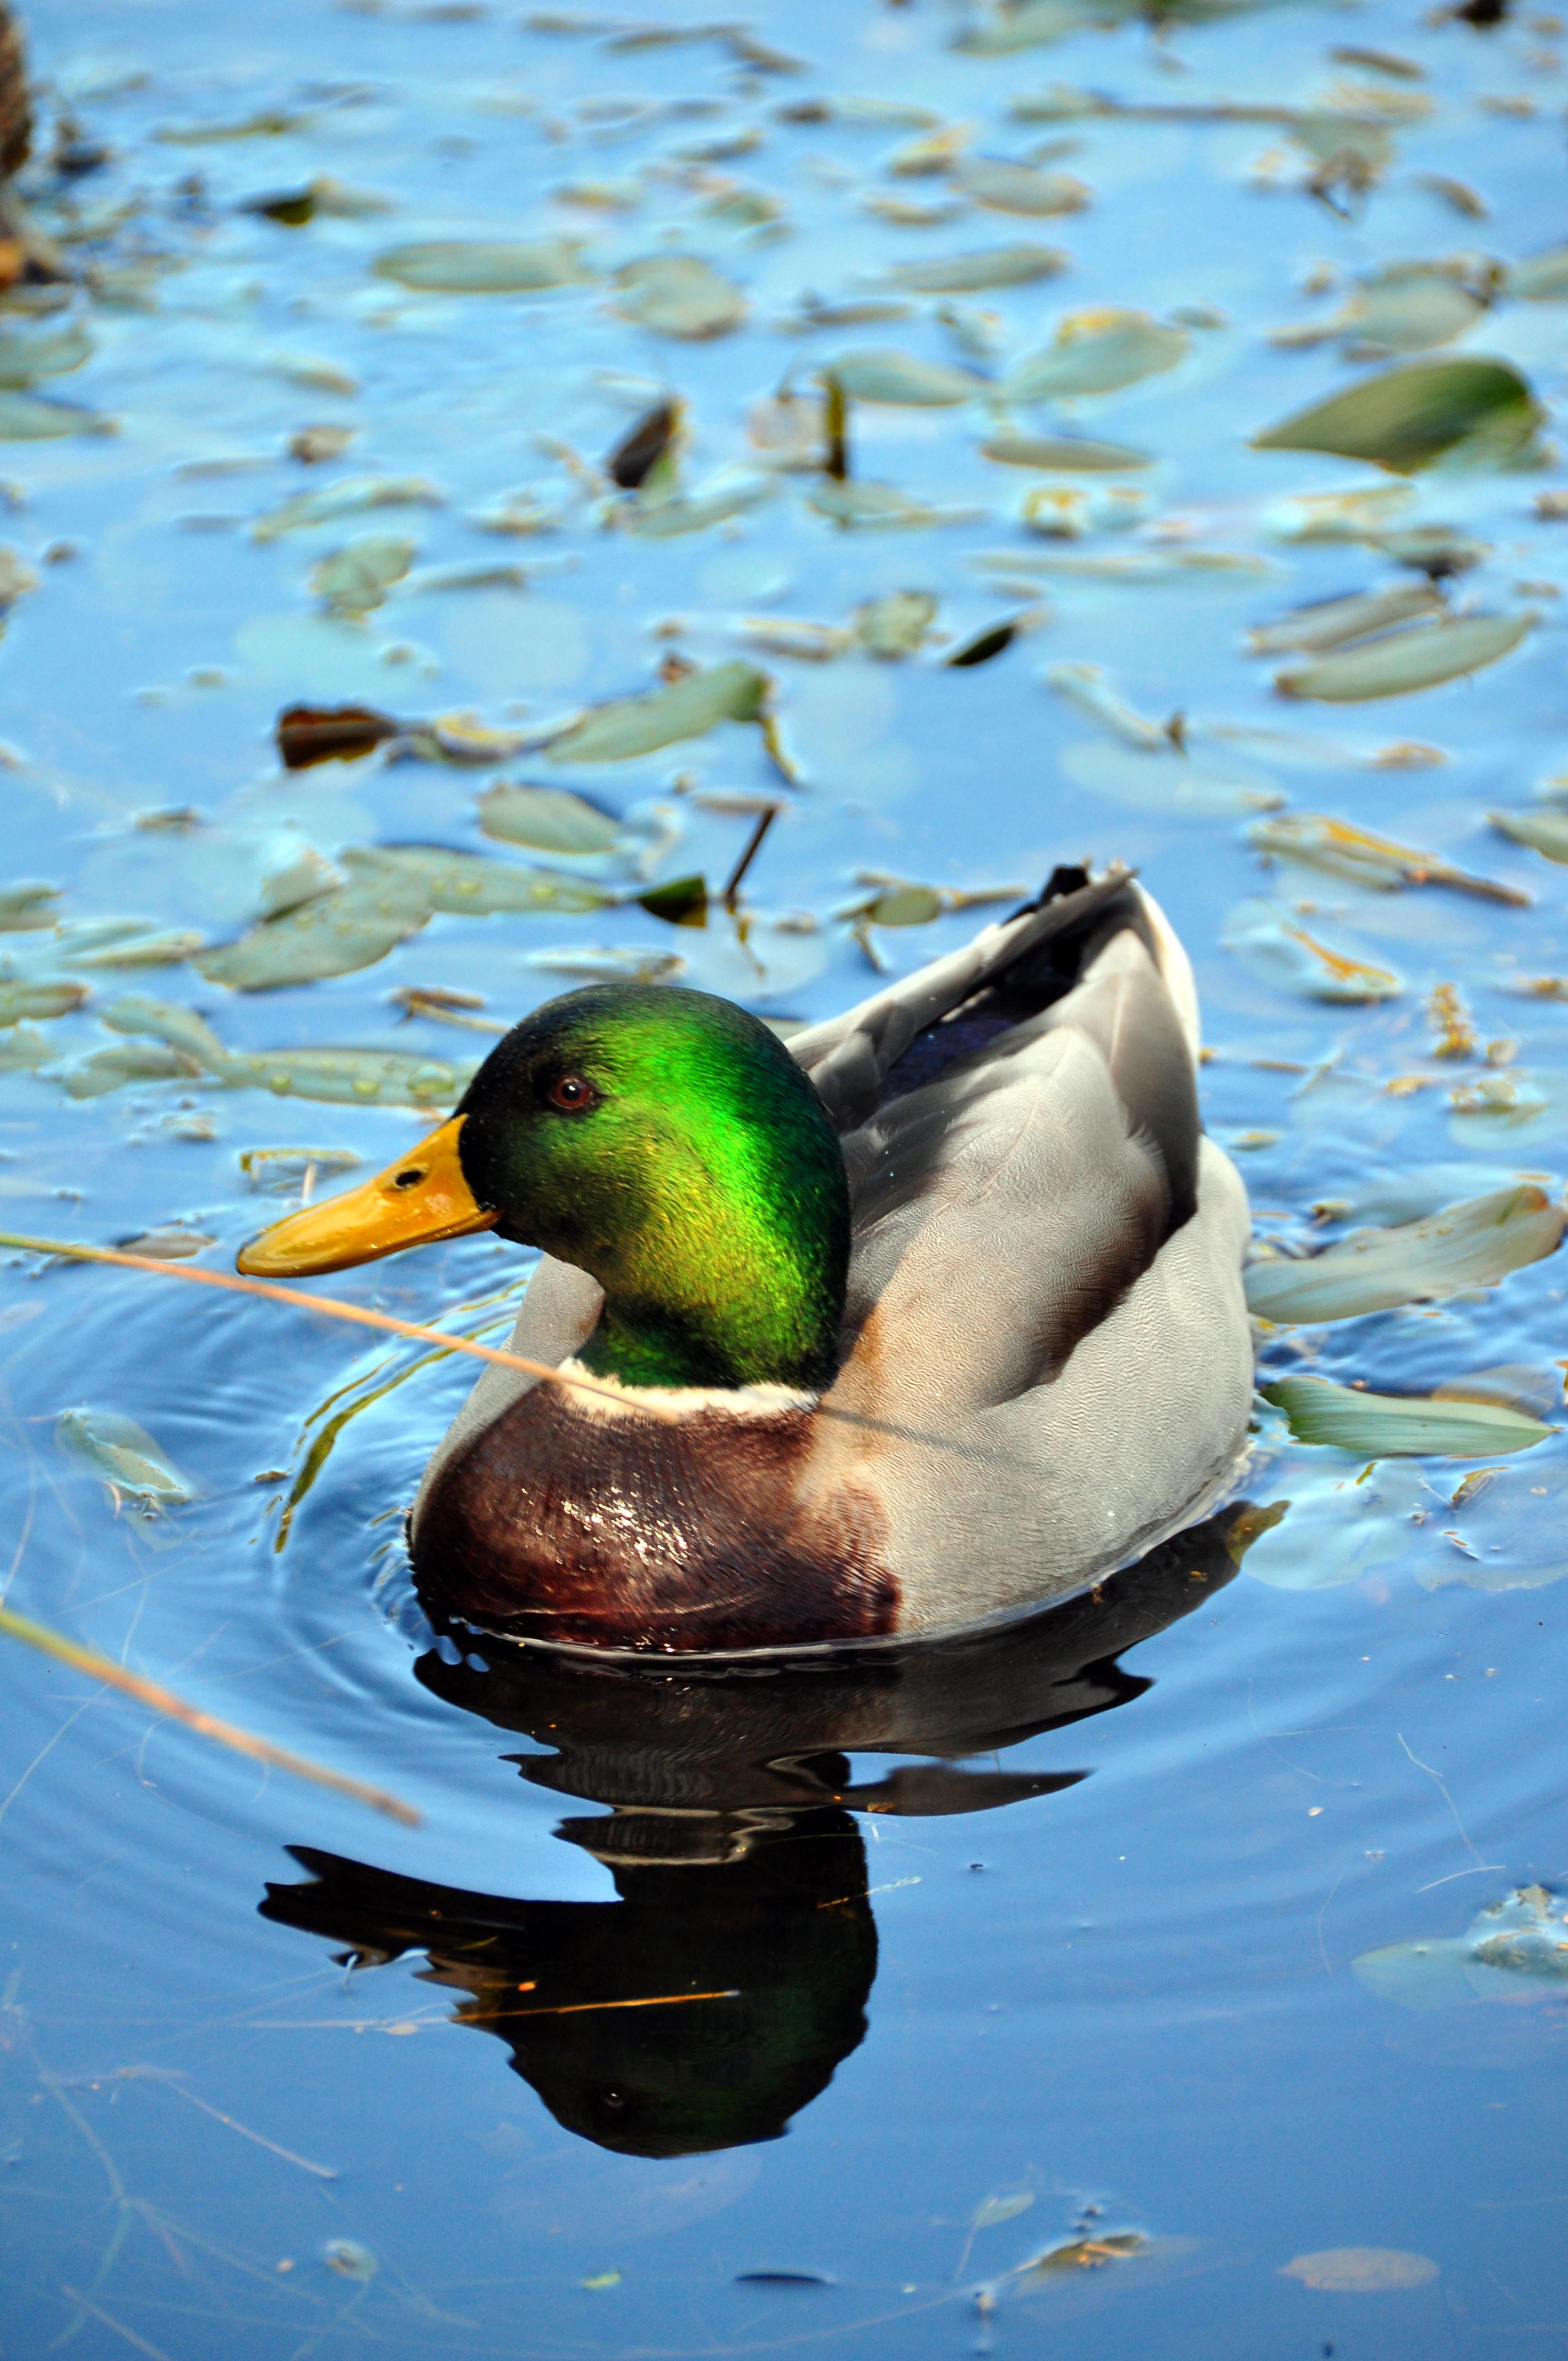 ducks swimming on the - photo #16